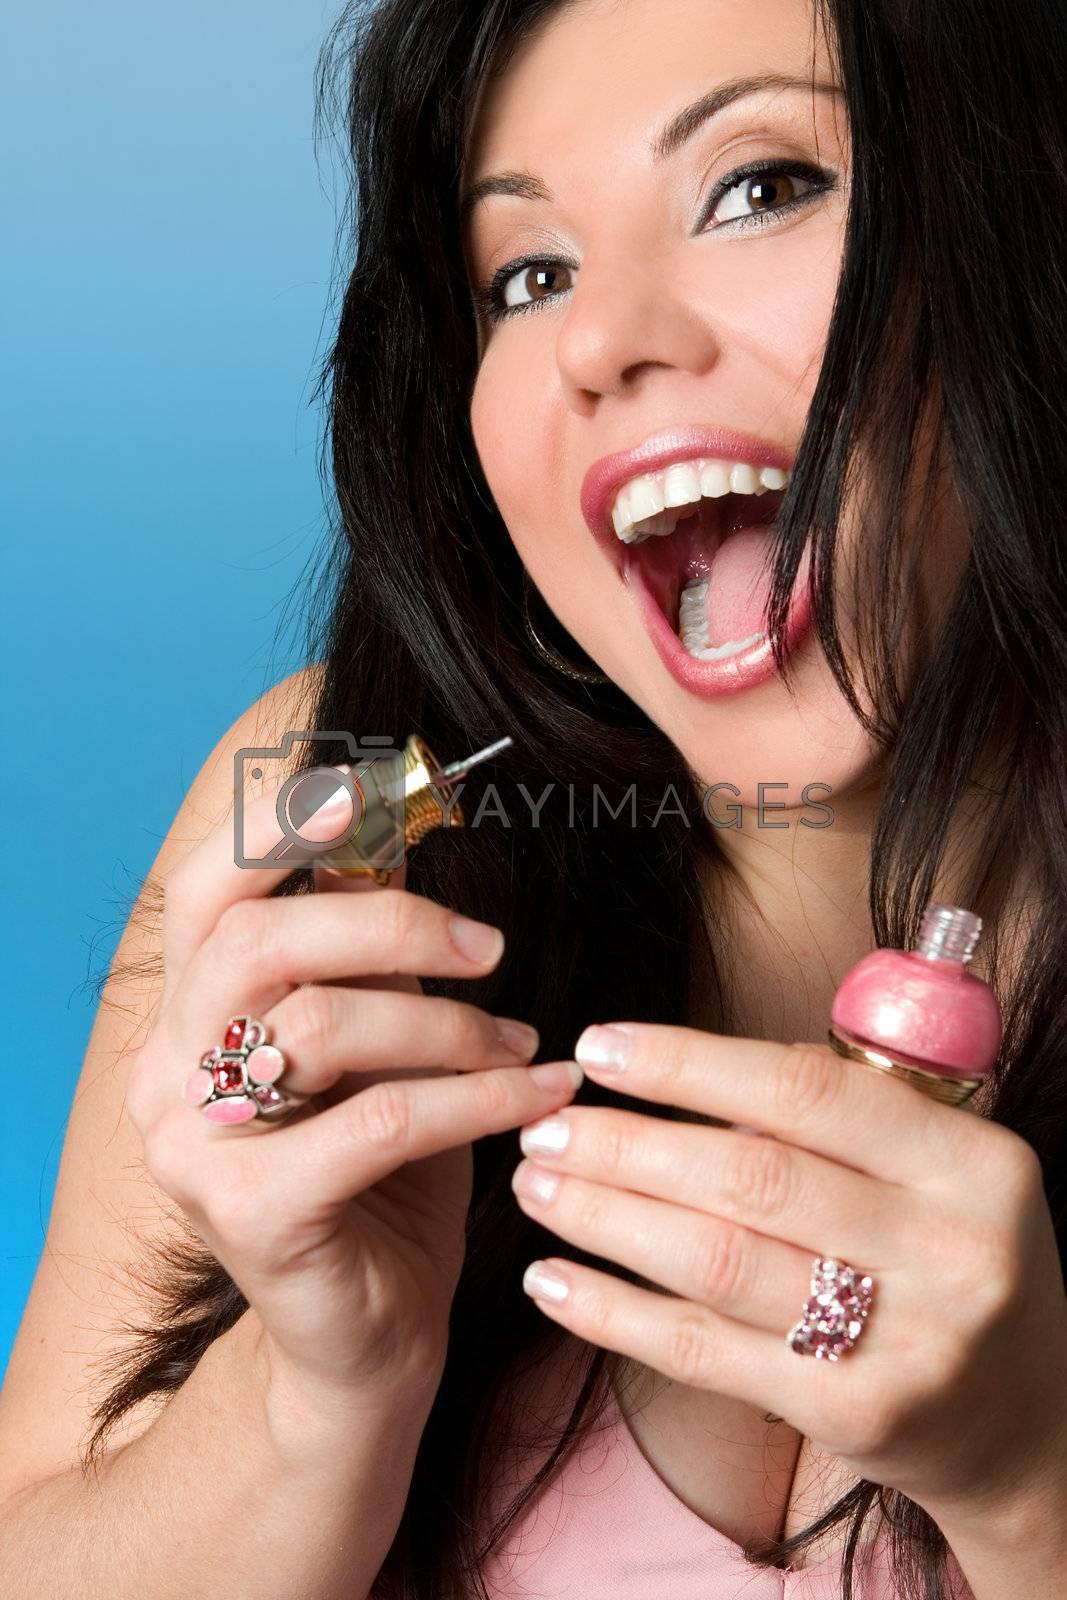 Beauty - woman with pink nailpolish by lovleah